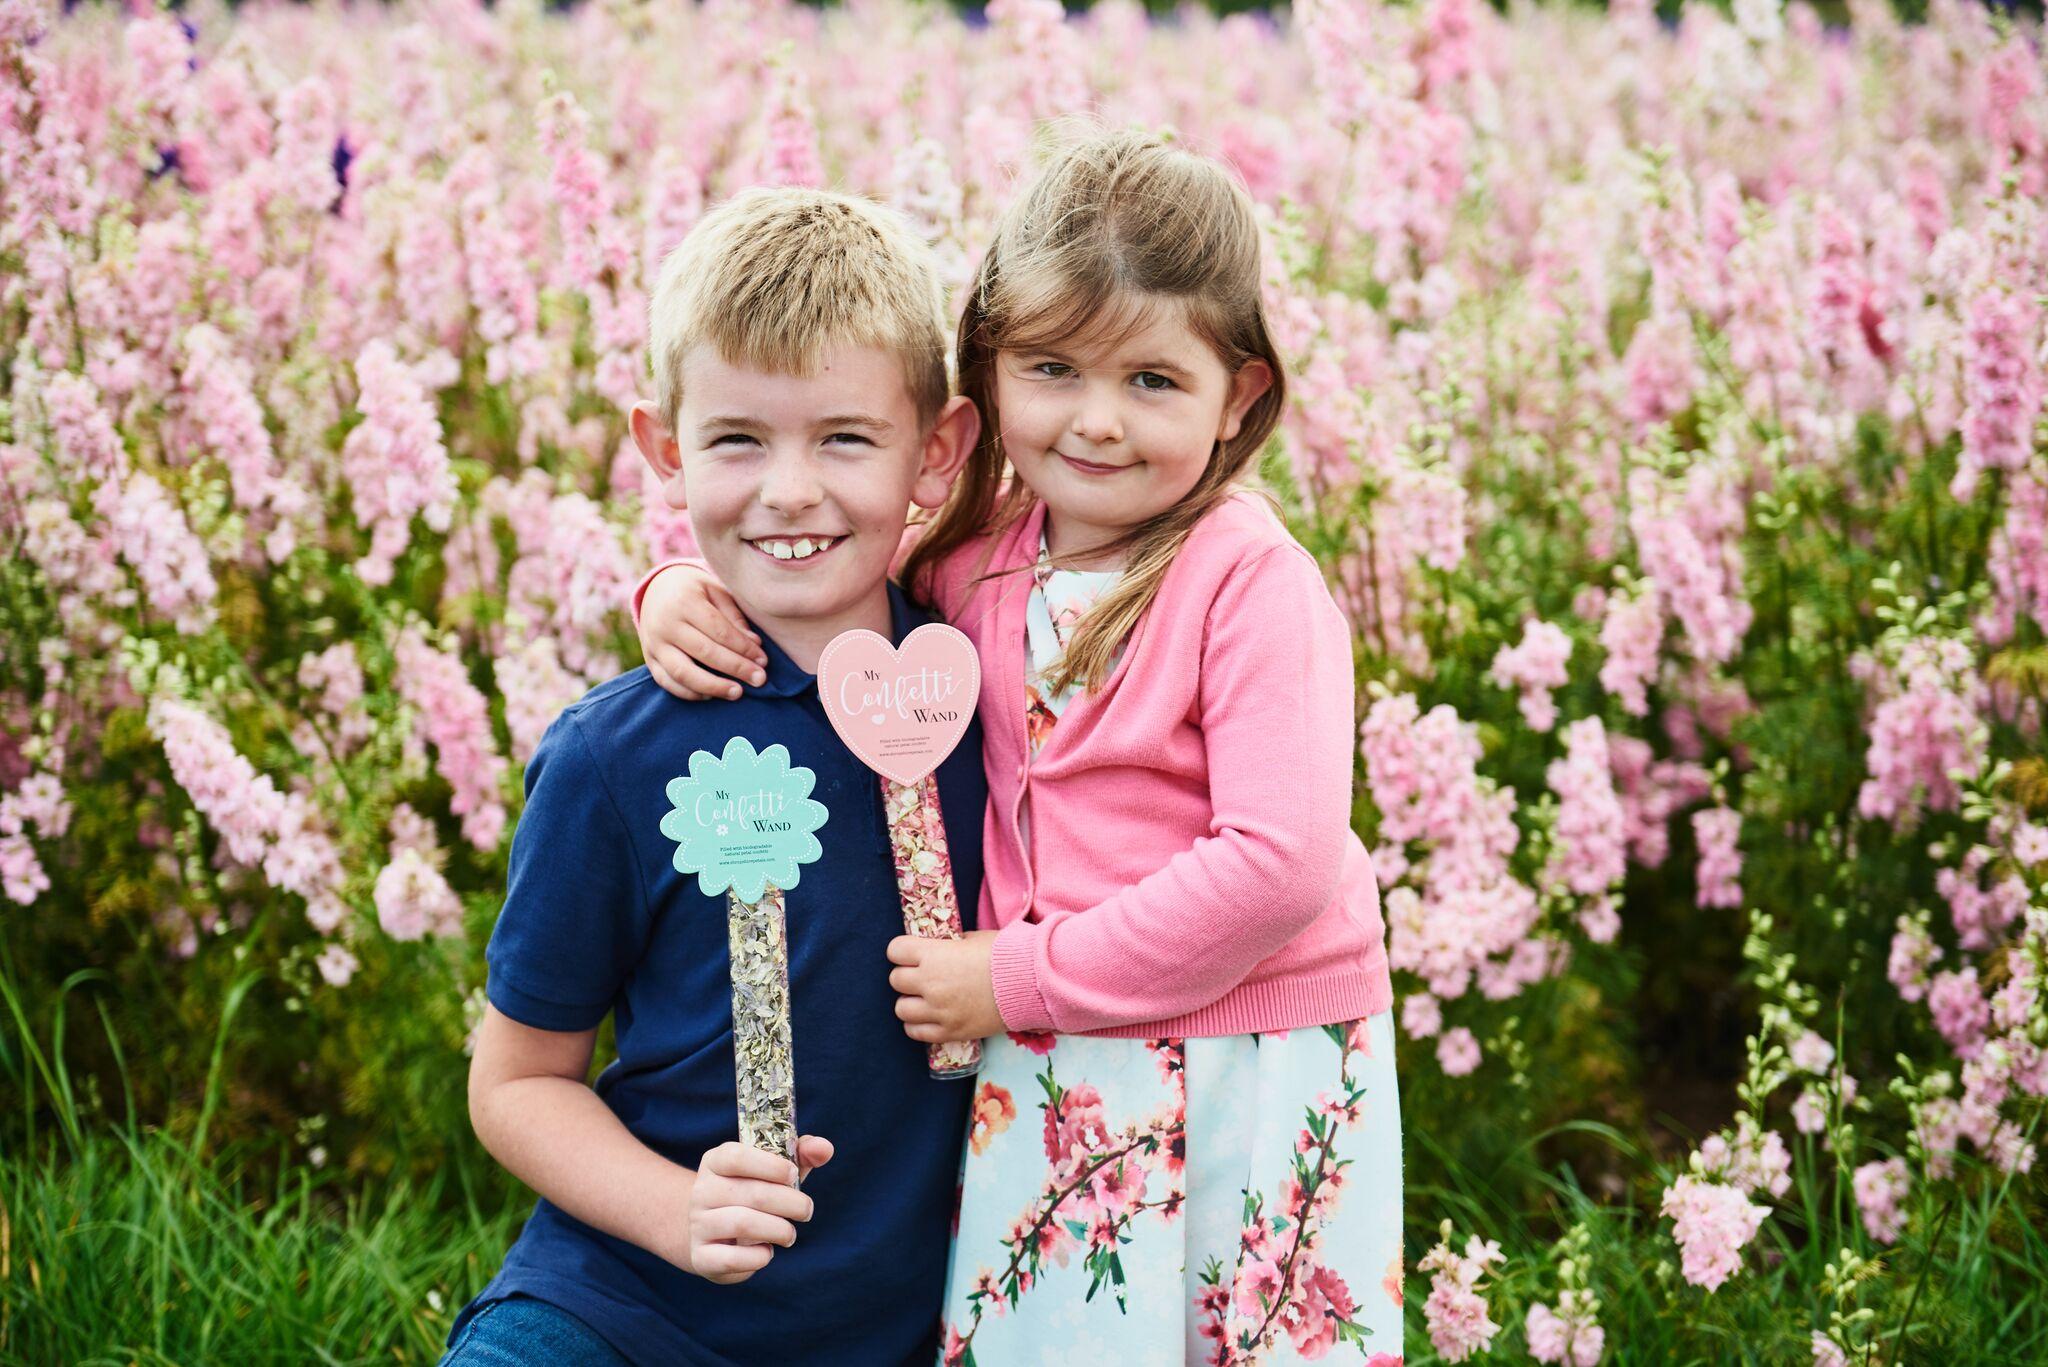 ShropshirePetals.com Heart and Flower Confetti Wands £3.50 each (2)